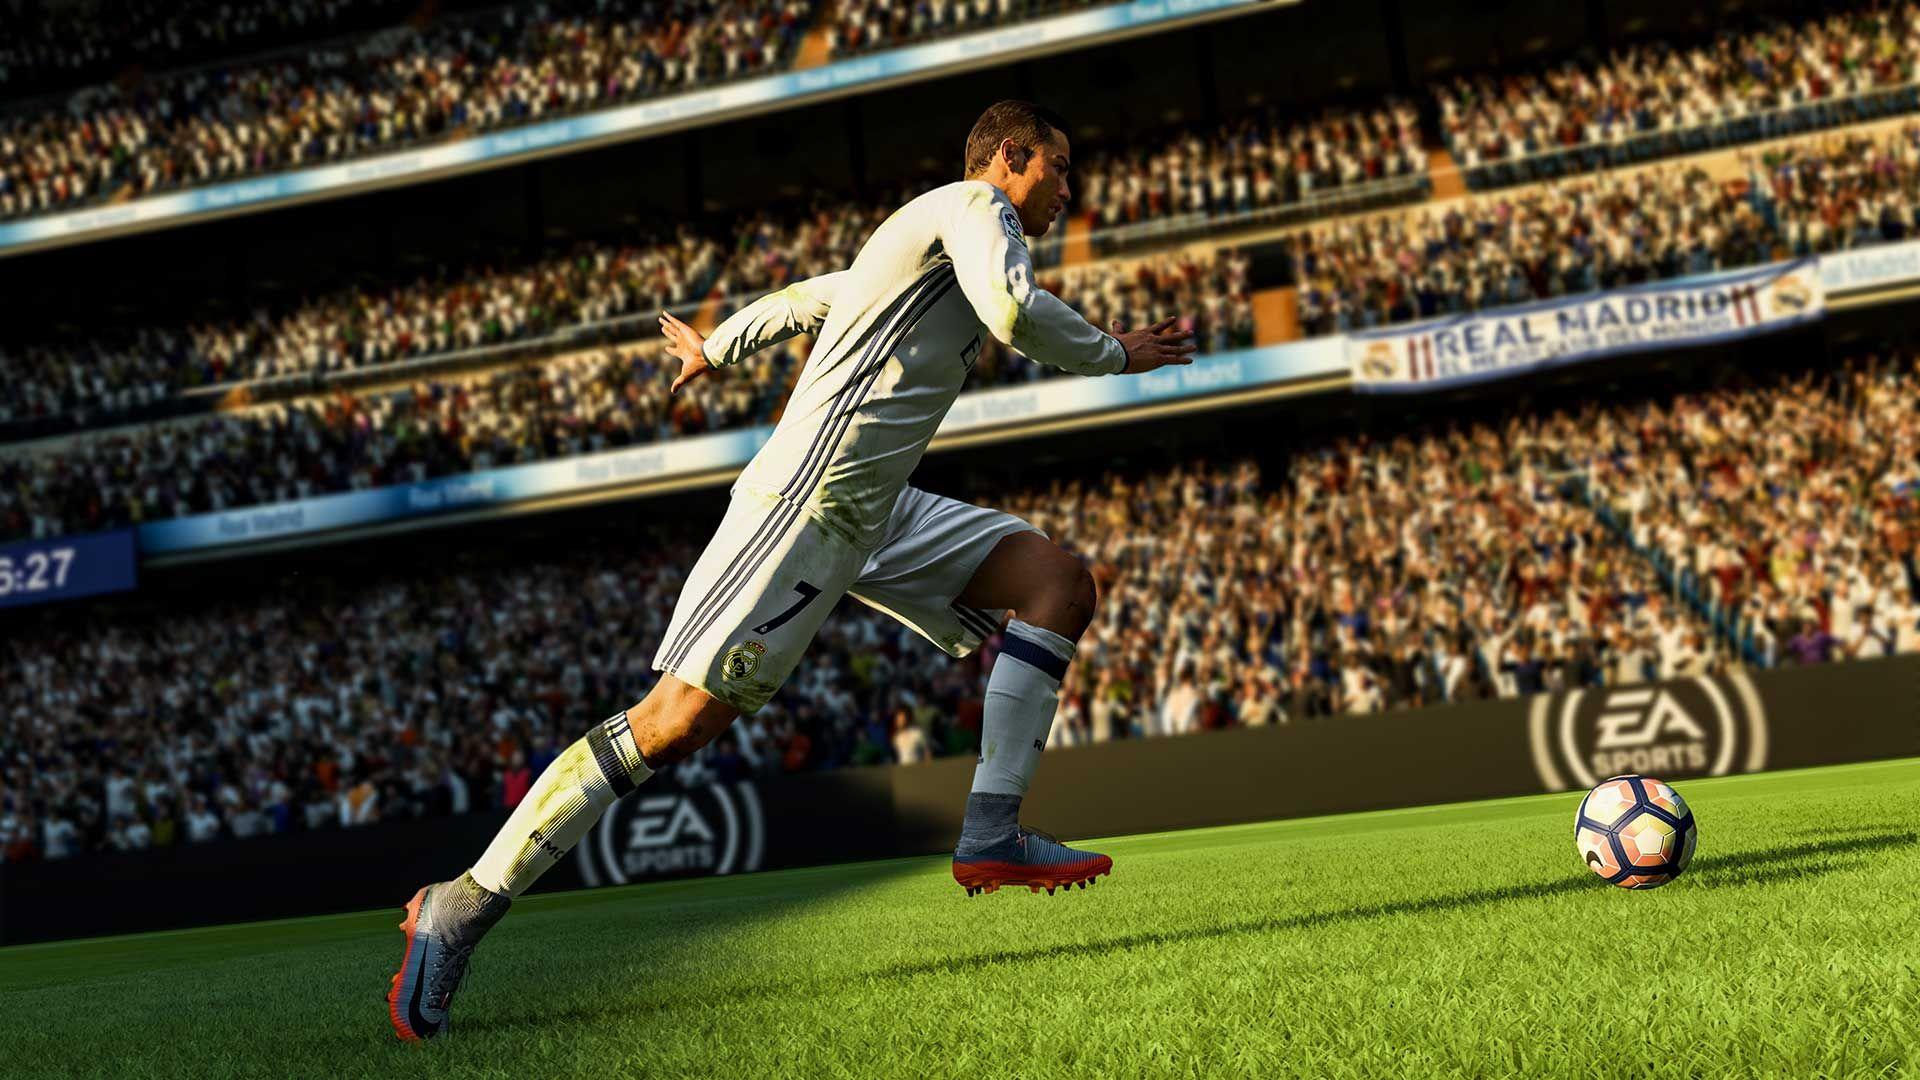 fifa18_pdp_screenshot_ronaldo_gameplay_en_ww_v1.jpg